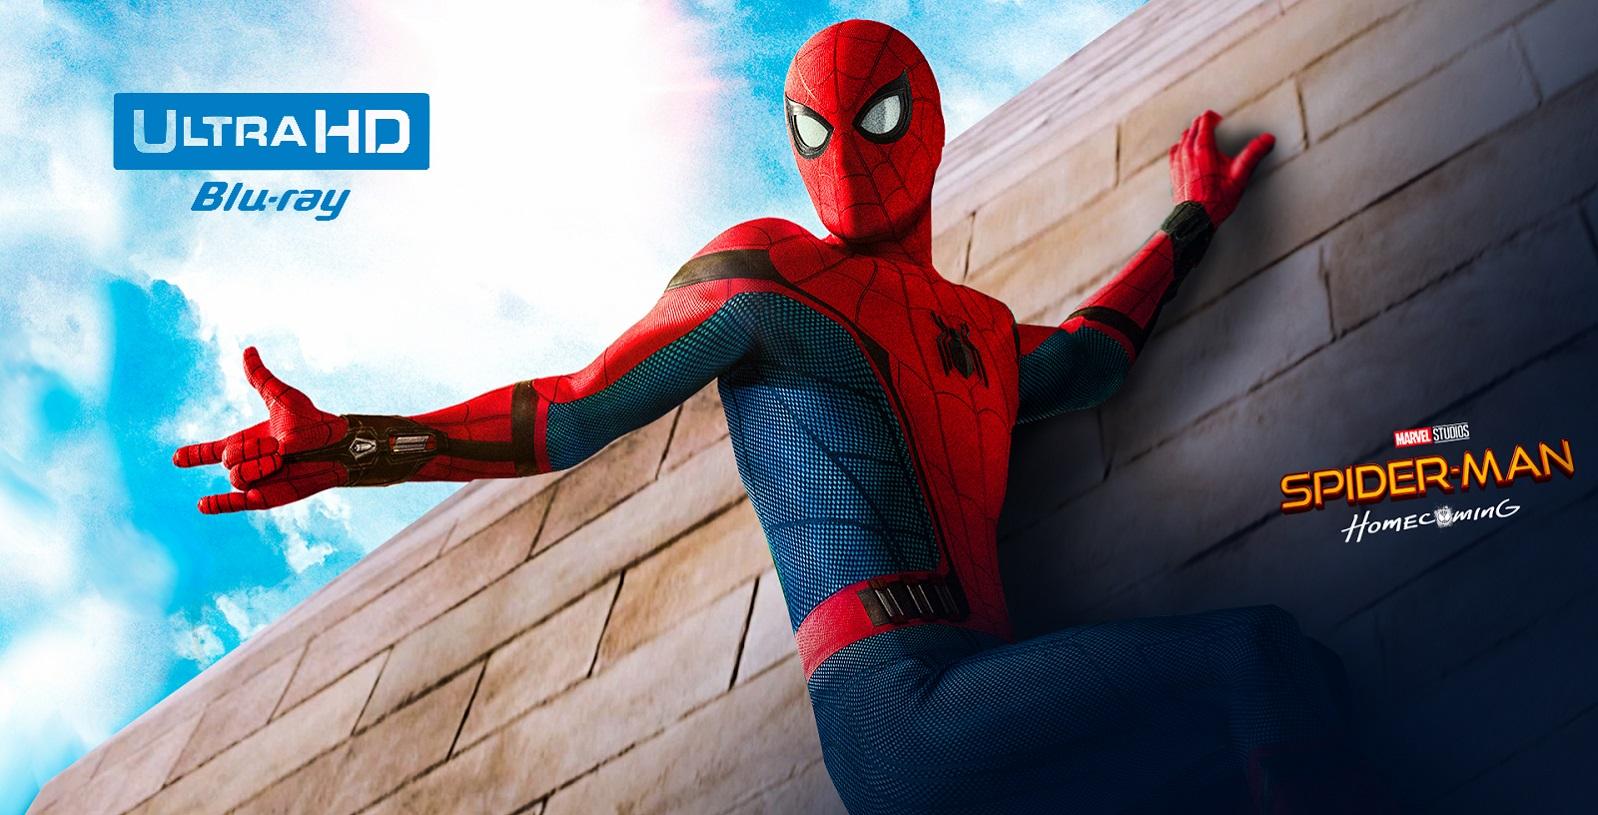 Spider-Man-Homecoming-4K-Ultra-HD-Blu-ray